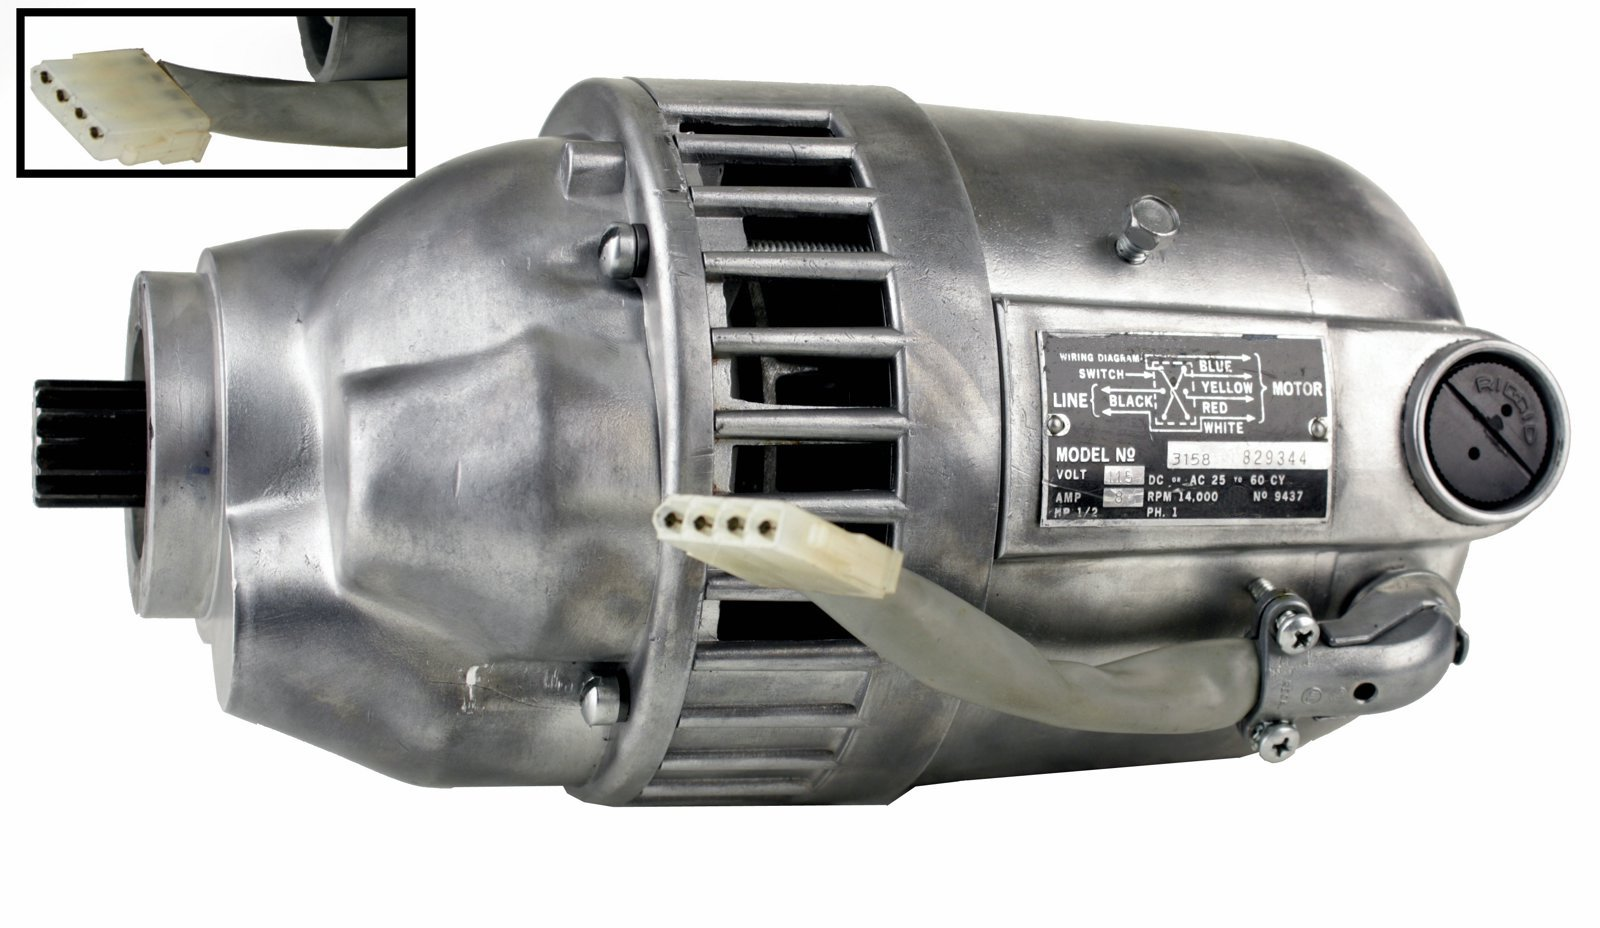 RIDGID 87740 Motor and Gear Box with White Plug (Certified Refurbished)